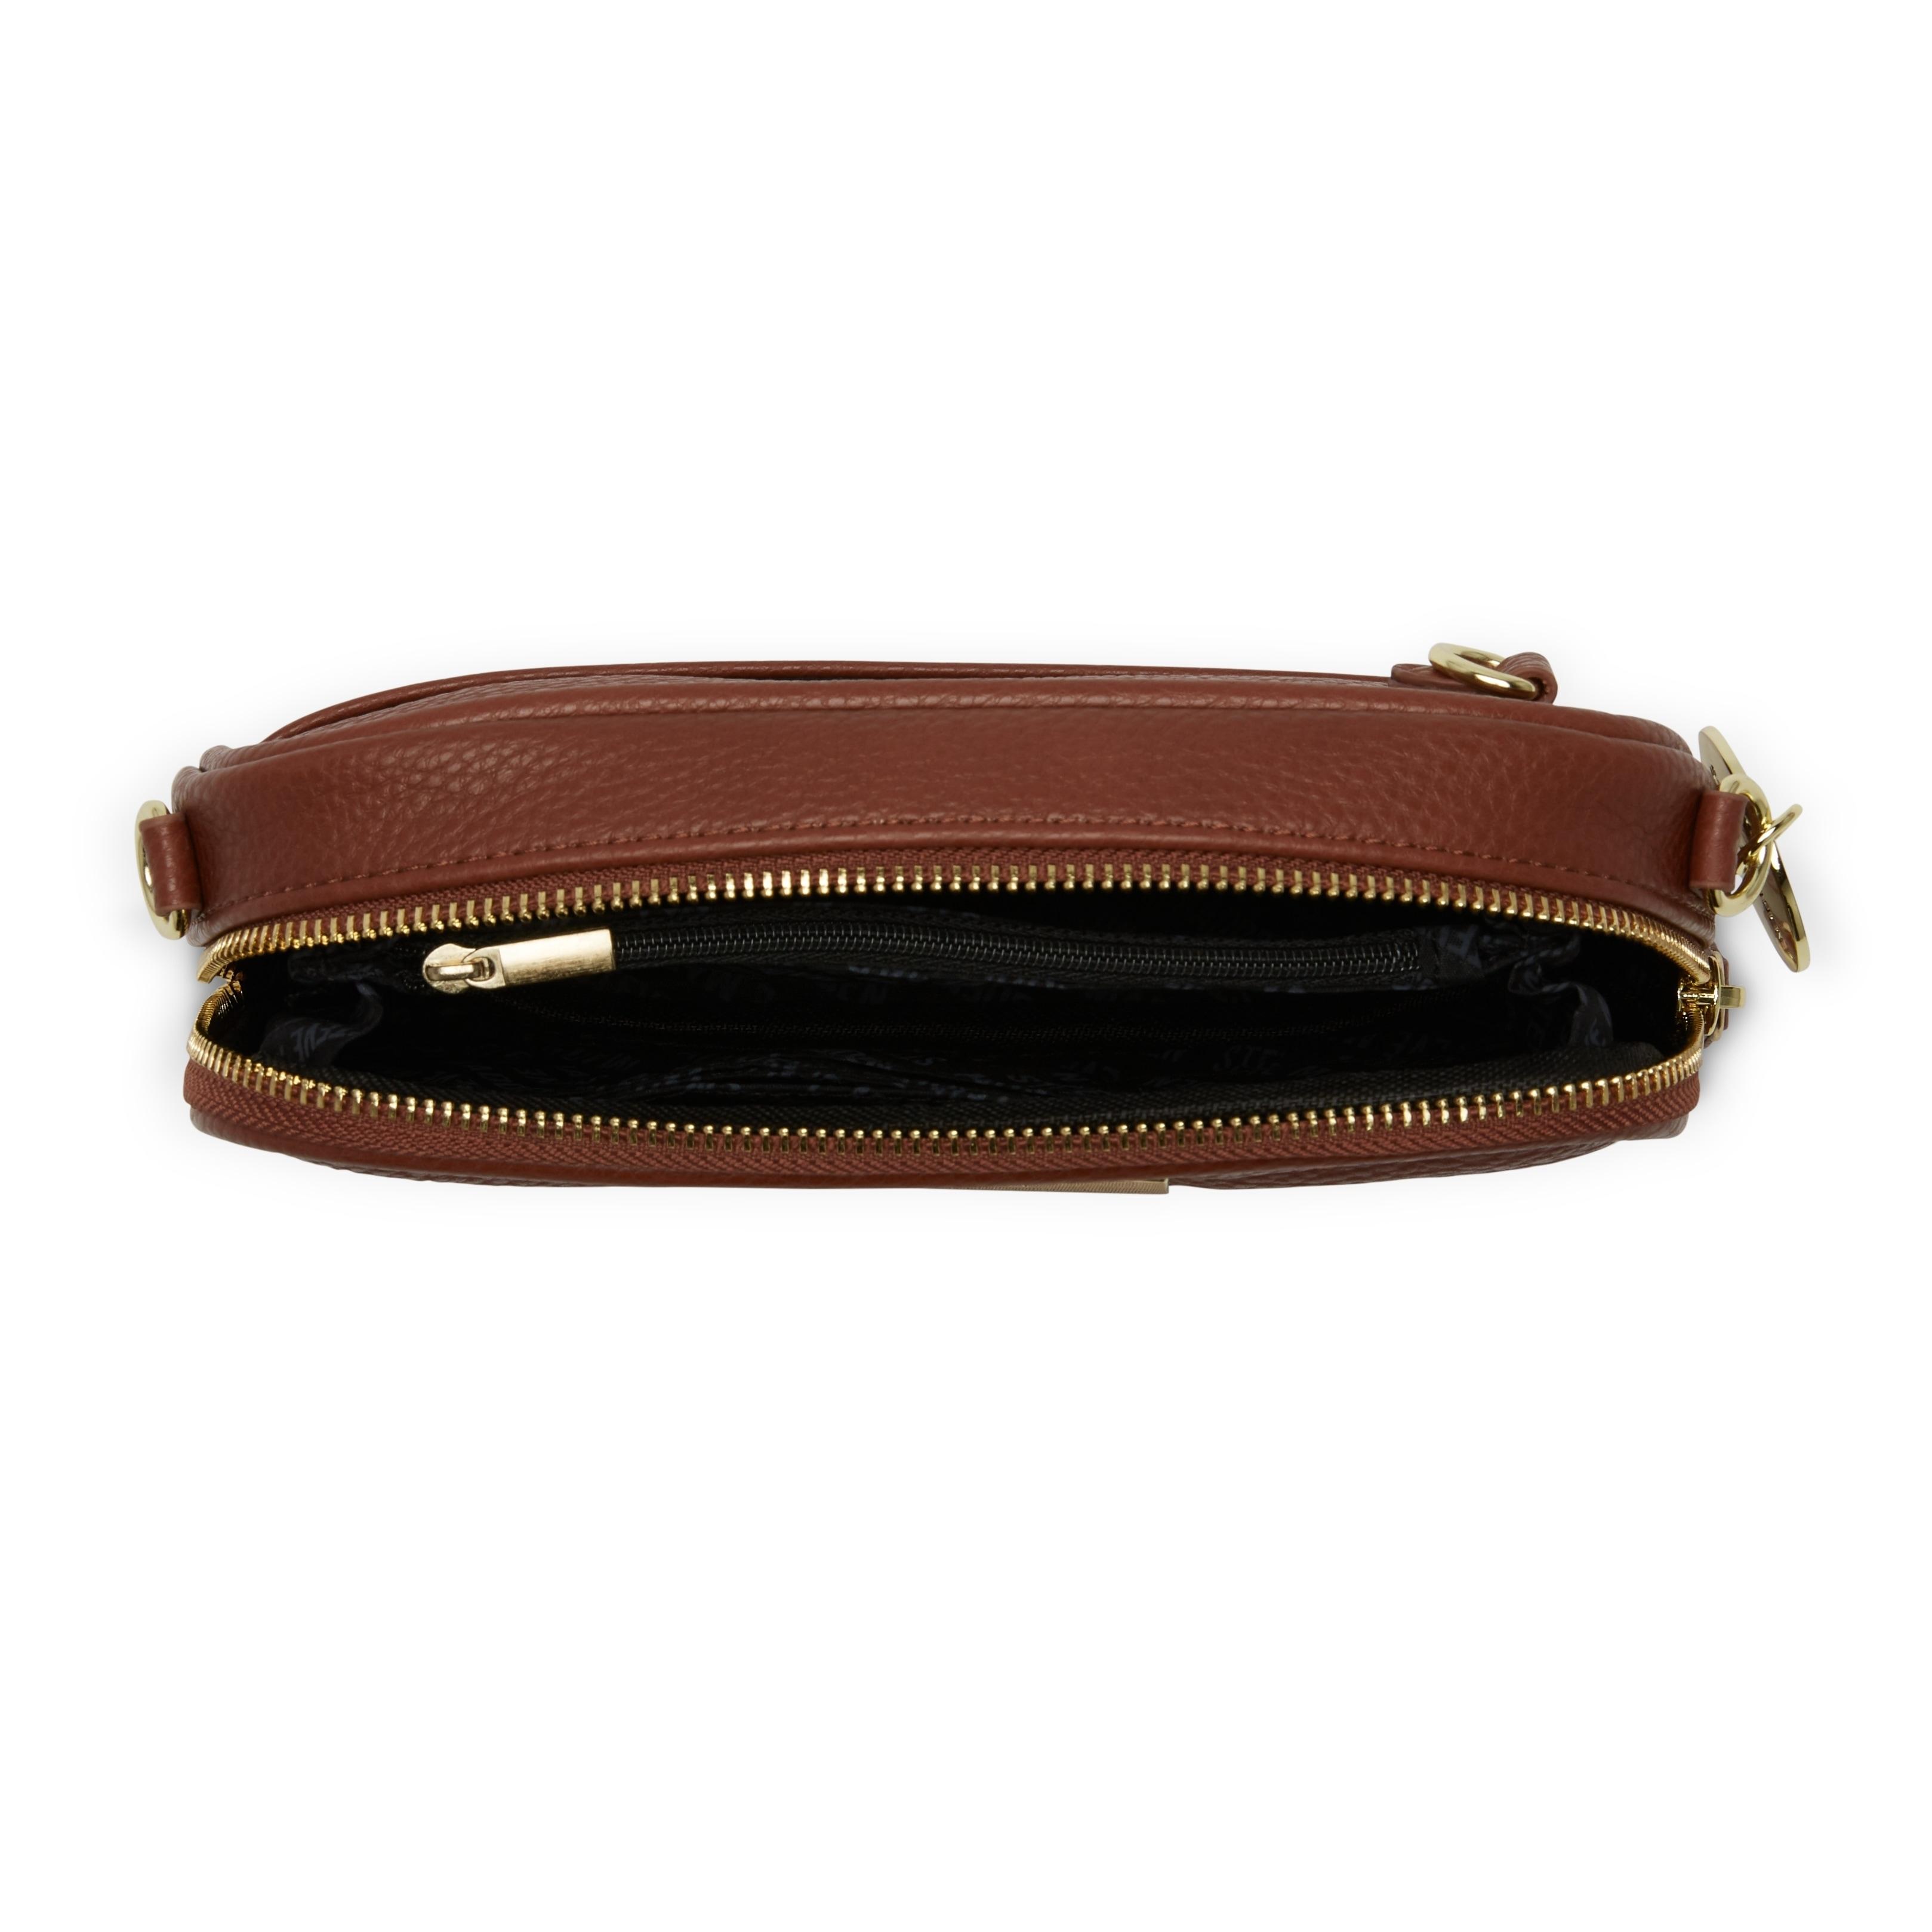 Shop Steve Madden BMagnolia Chevron Quilted Crossbody Handbag - Free  Shipping On Orders Over  45 - Overstock - 18000666 83de82fd818d2